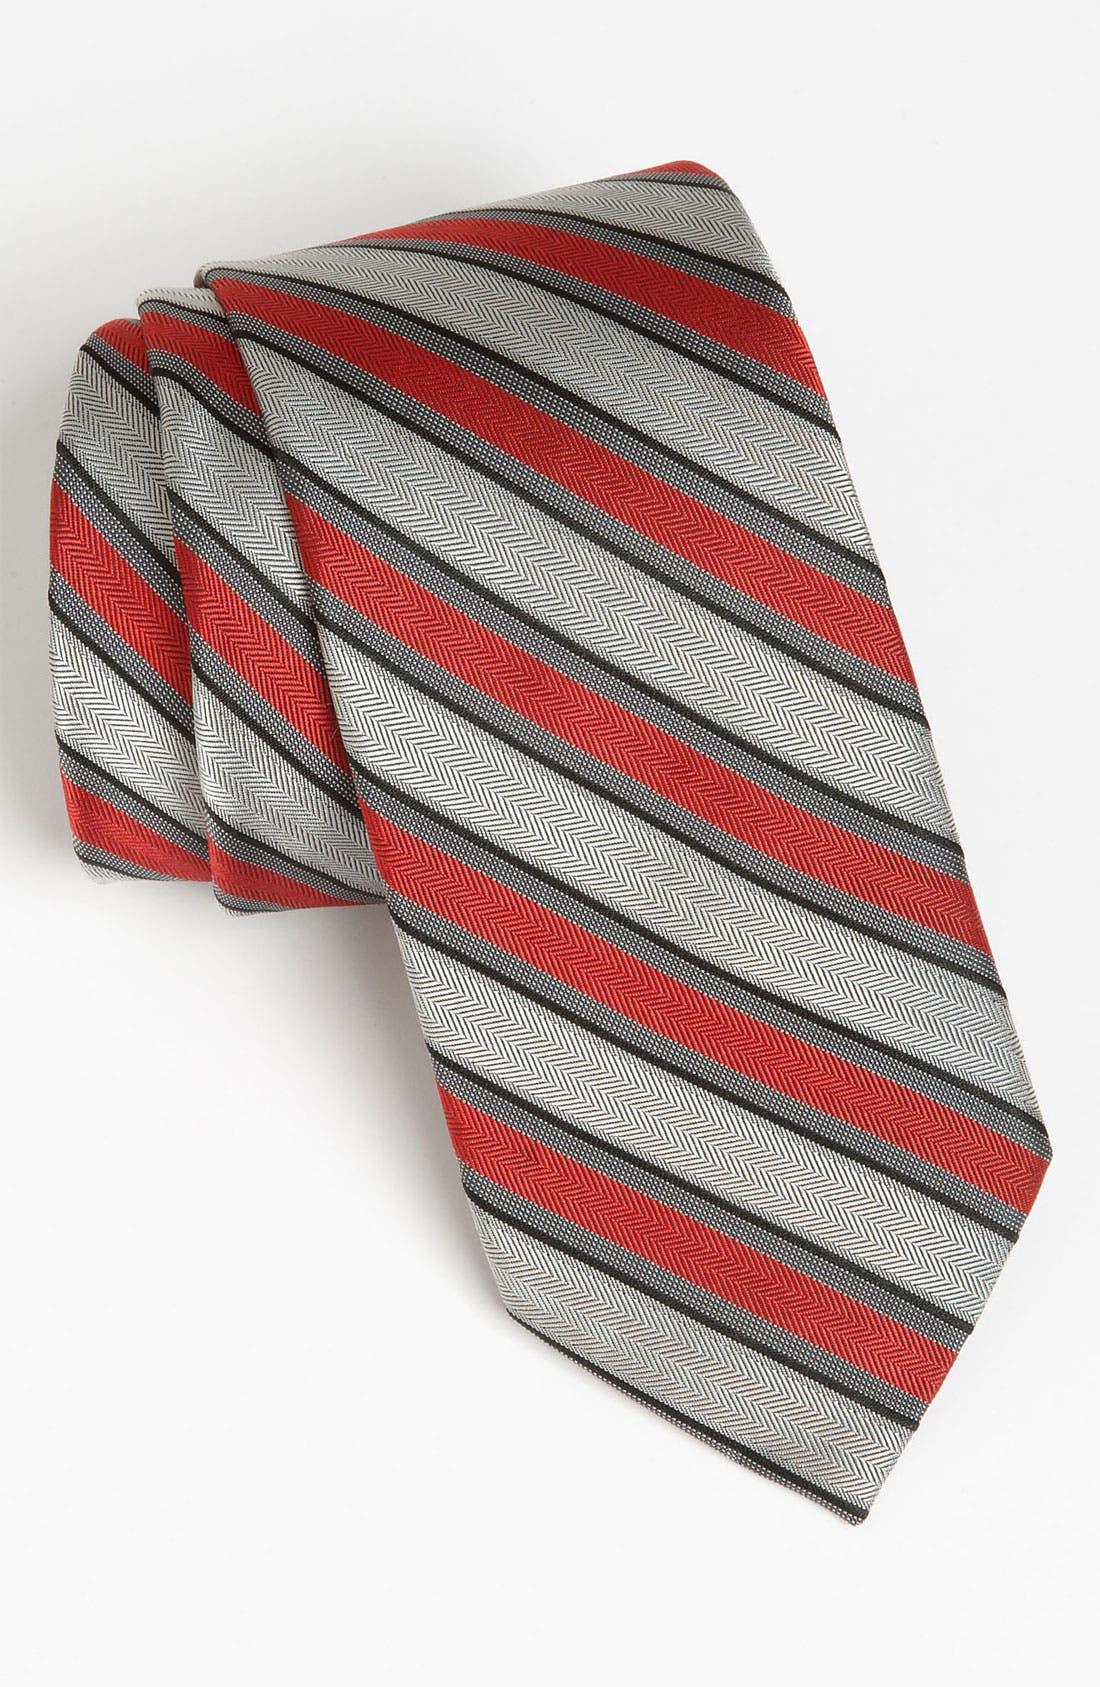 Alternate Image 1 Selected - Calvin Klein Woven Tie